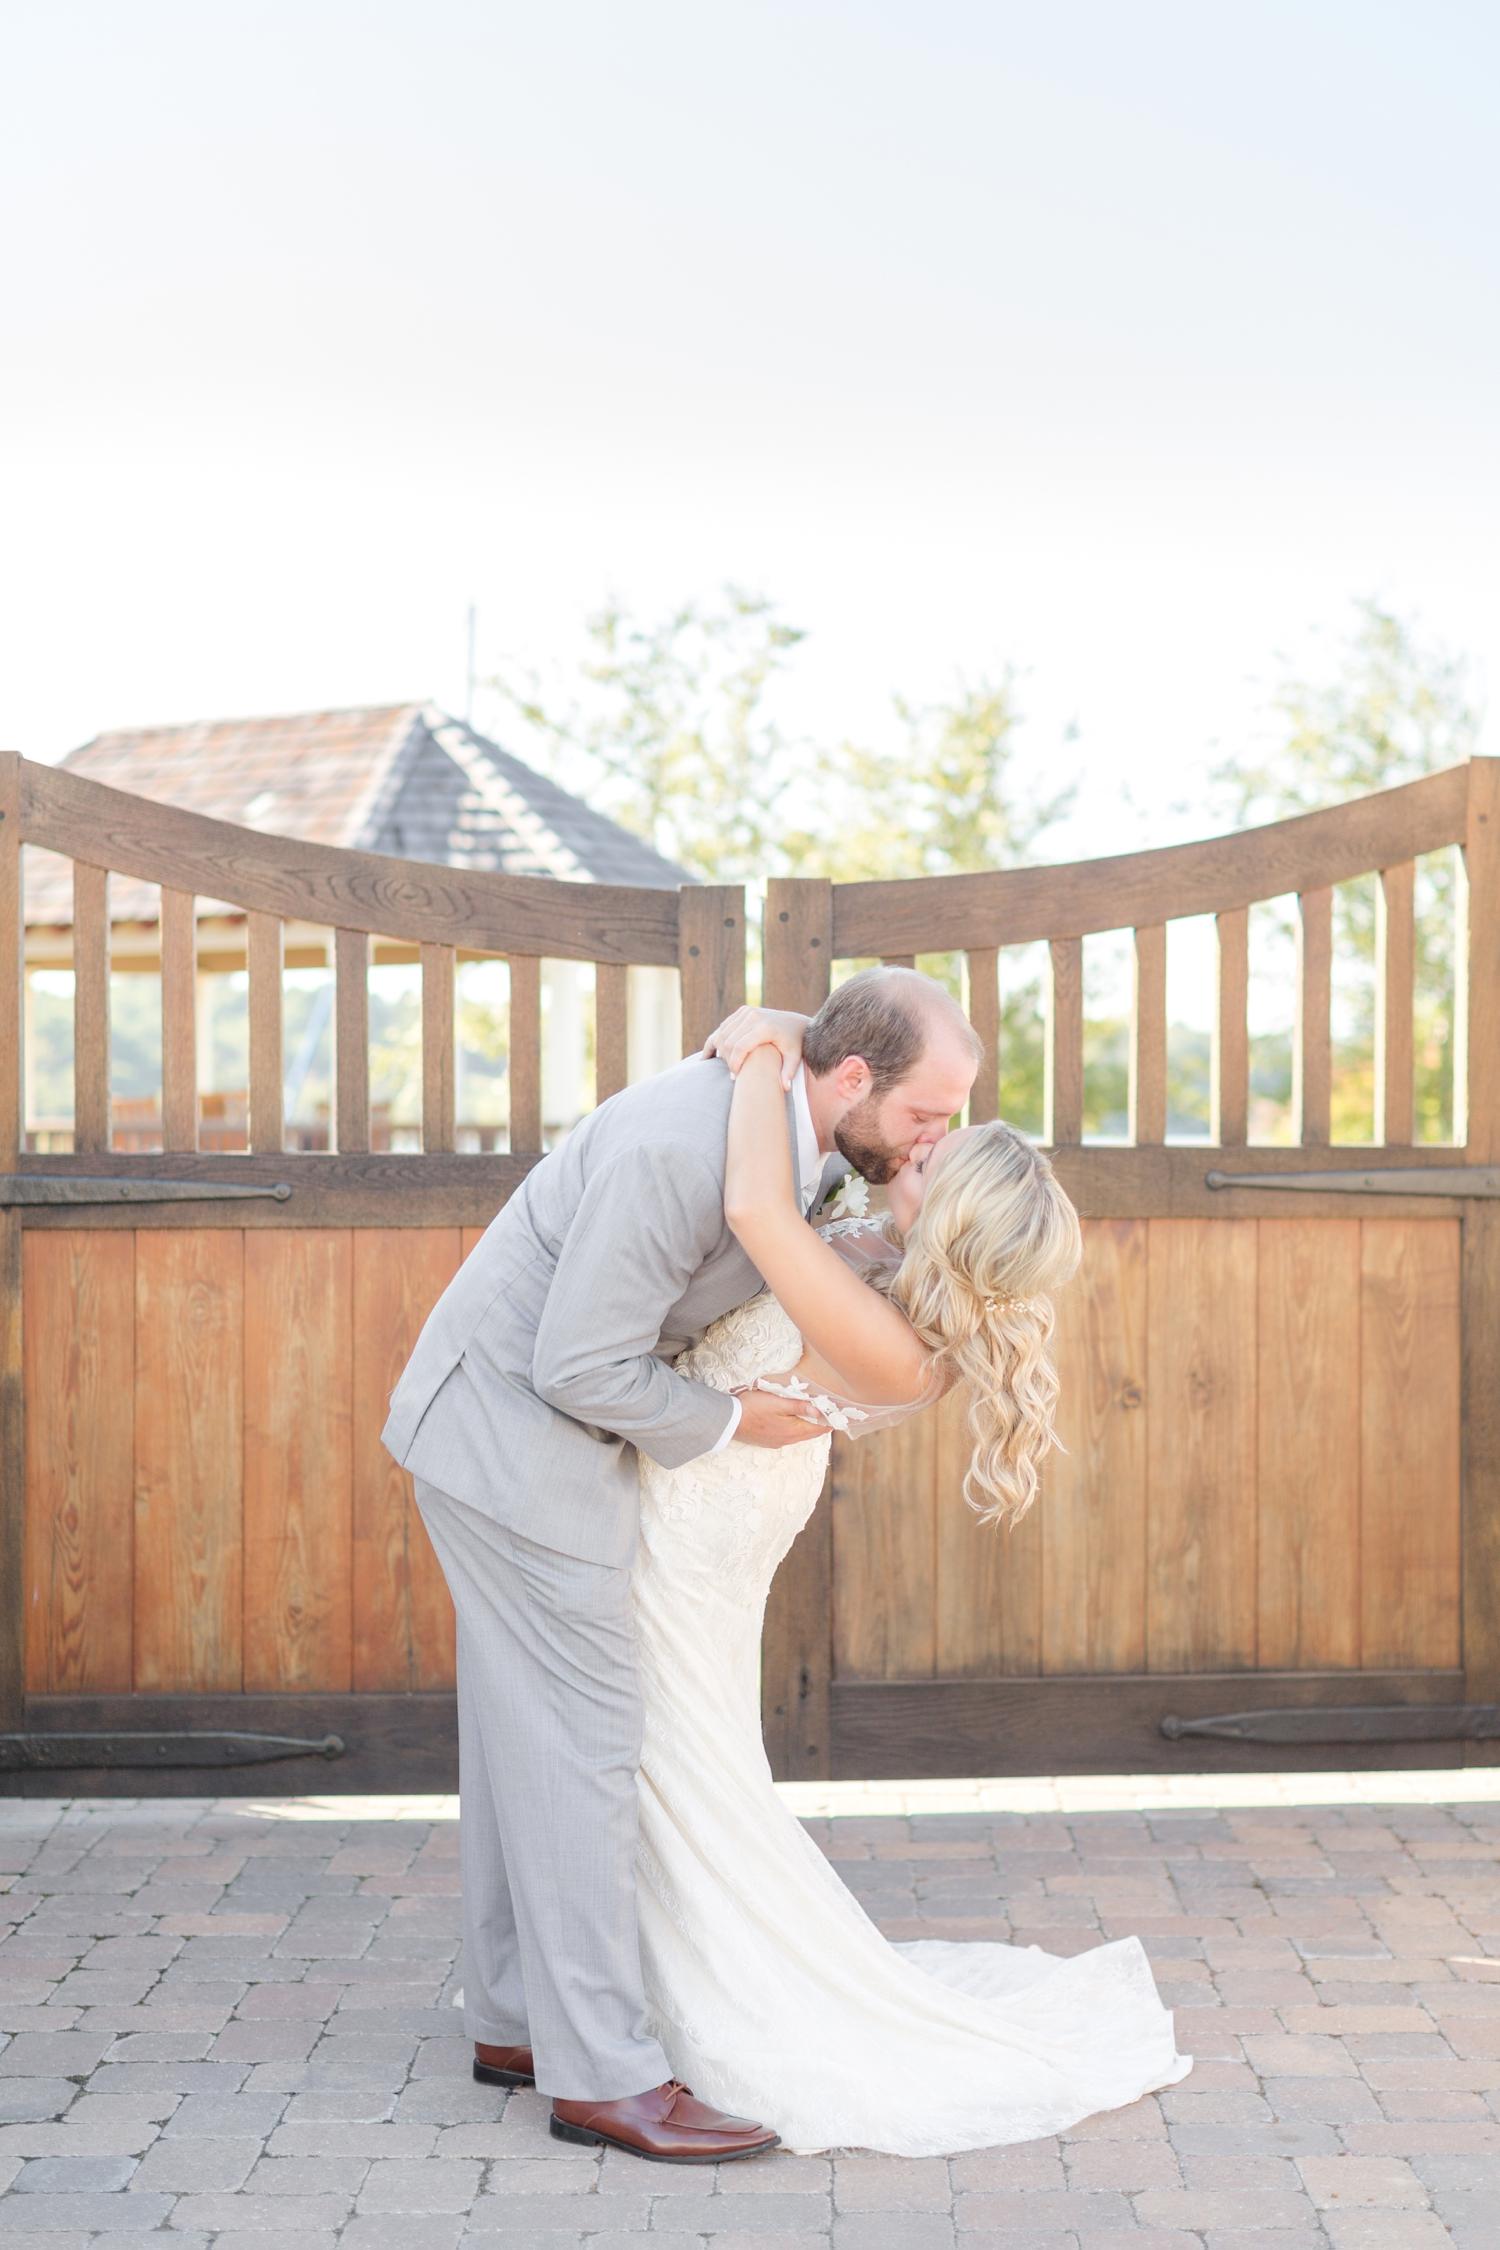 LANG WEDDING HIGHGLIGHTS-167_maryland-and-virginia-wedding-photographer-anna-grace-photography-photo.jpg